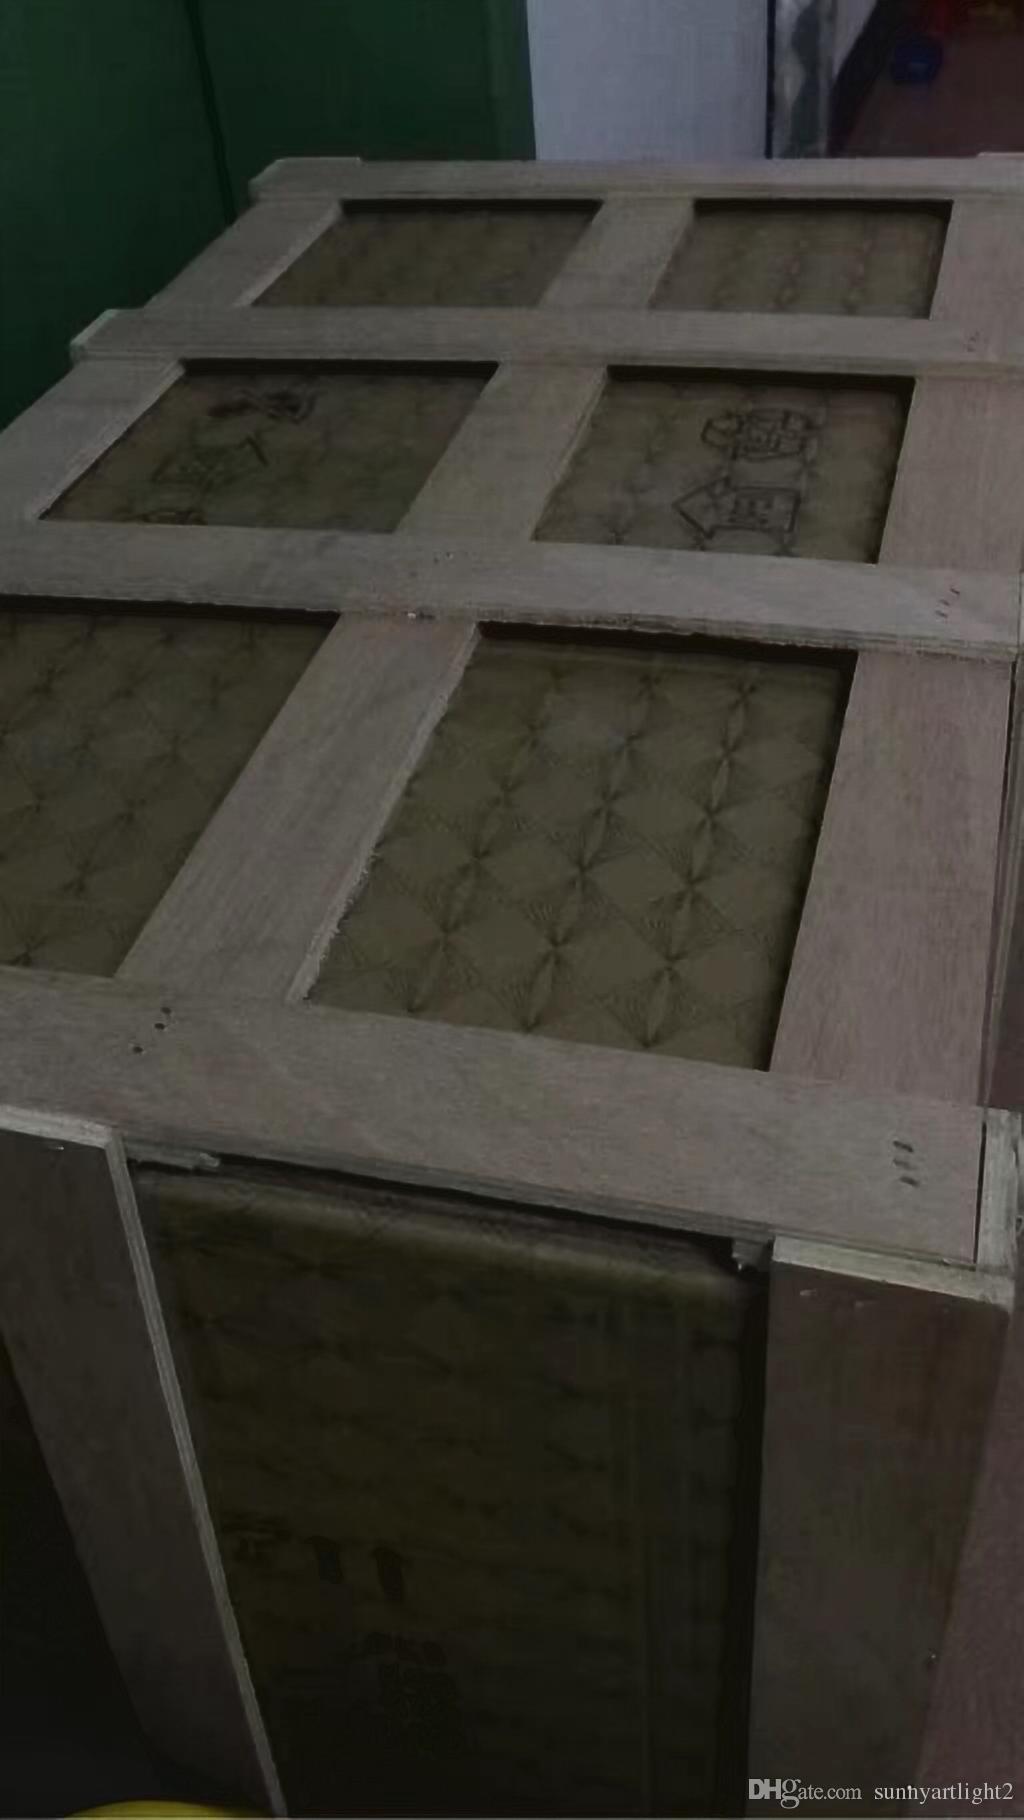 Hot Sale China Factory-outlet Modern Artesanato vidro fundido Chandelier Murano Estilo Candelabro com LED Fonte de Luz